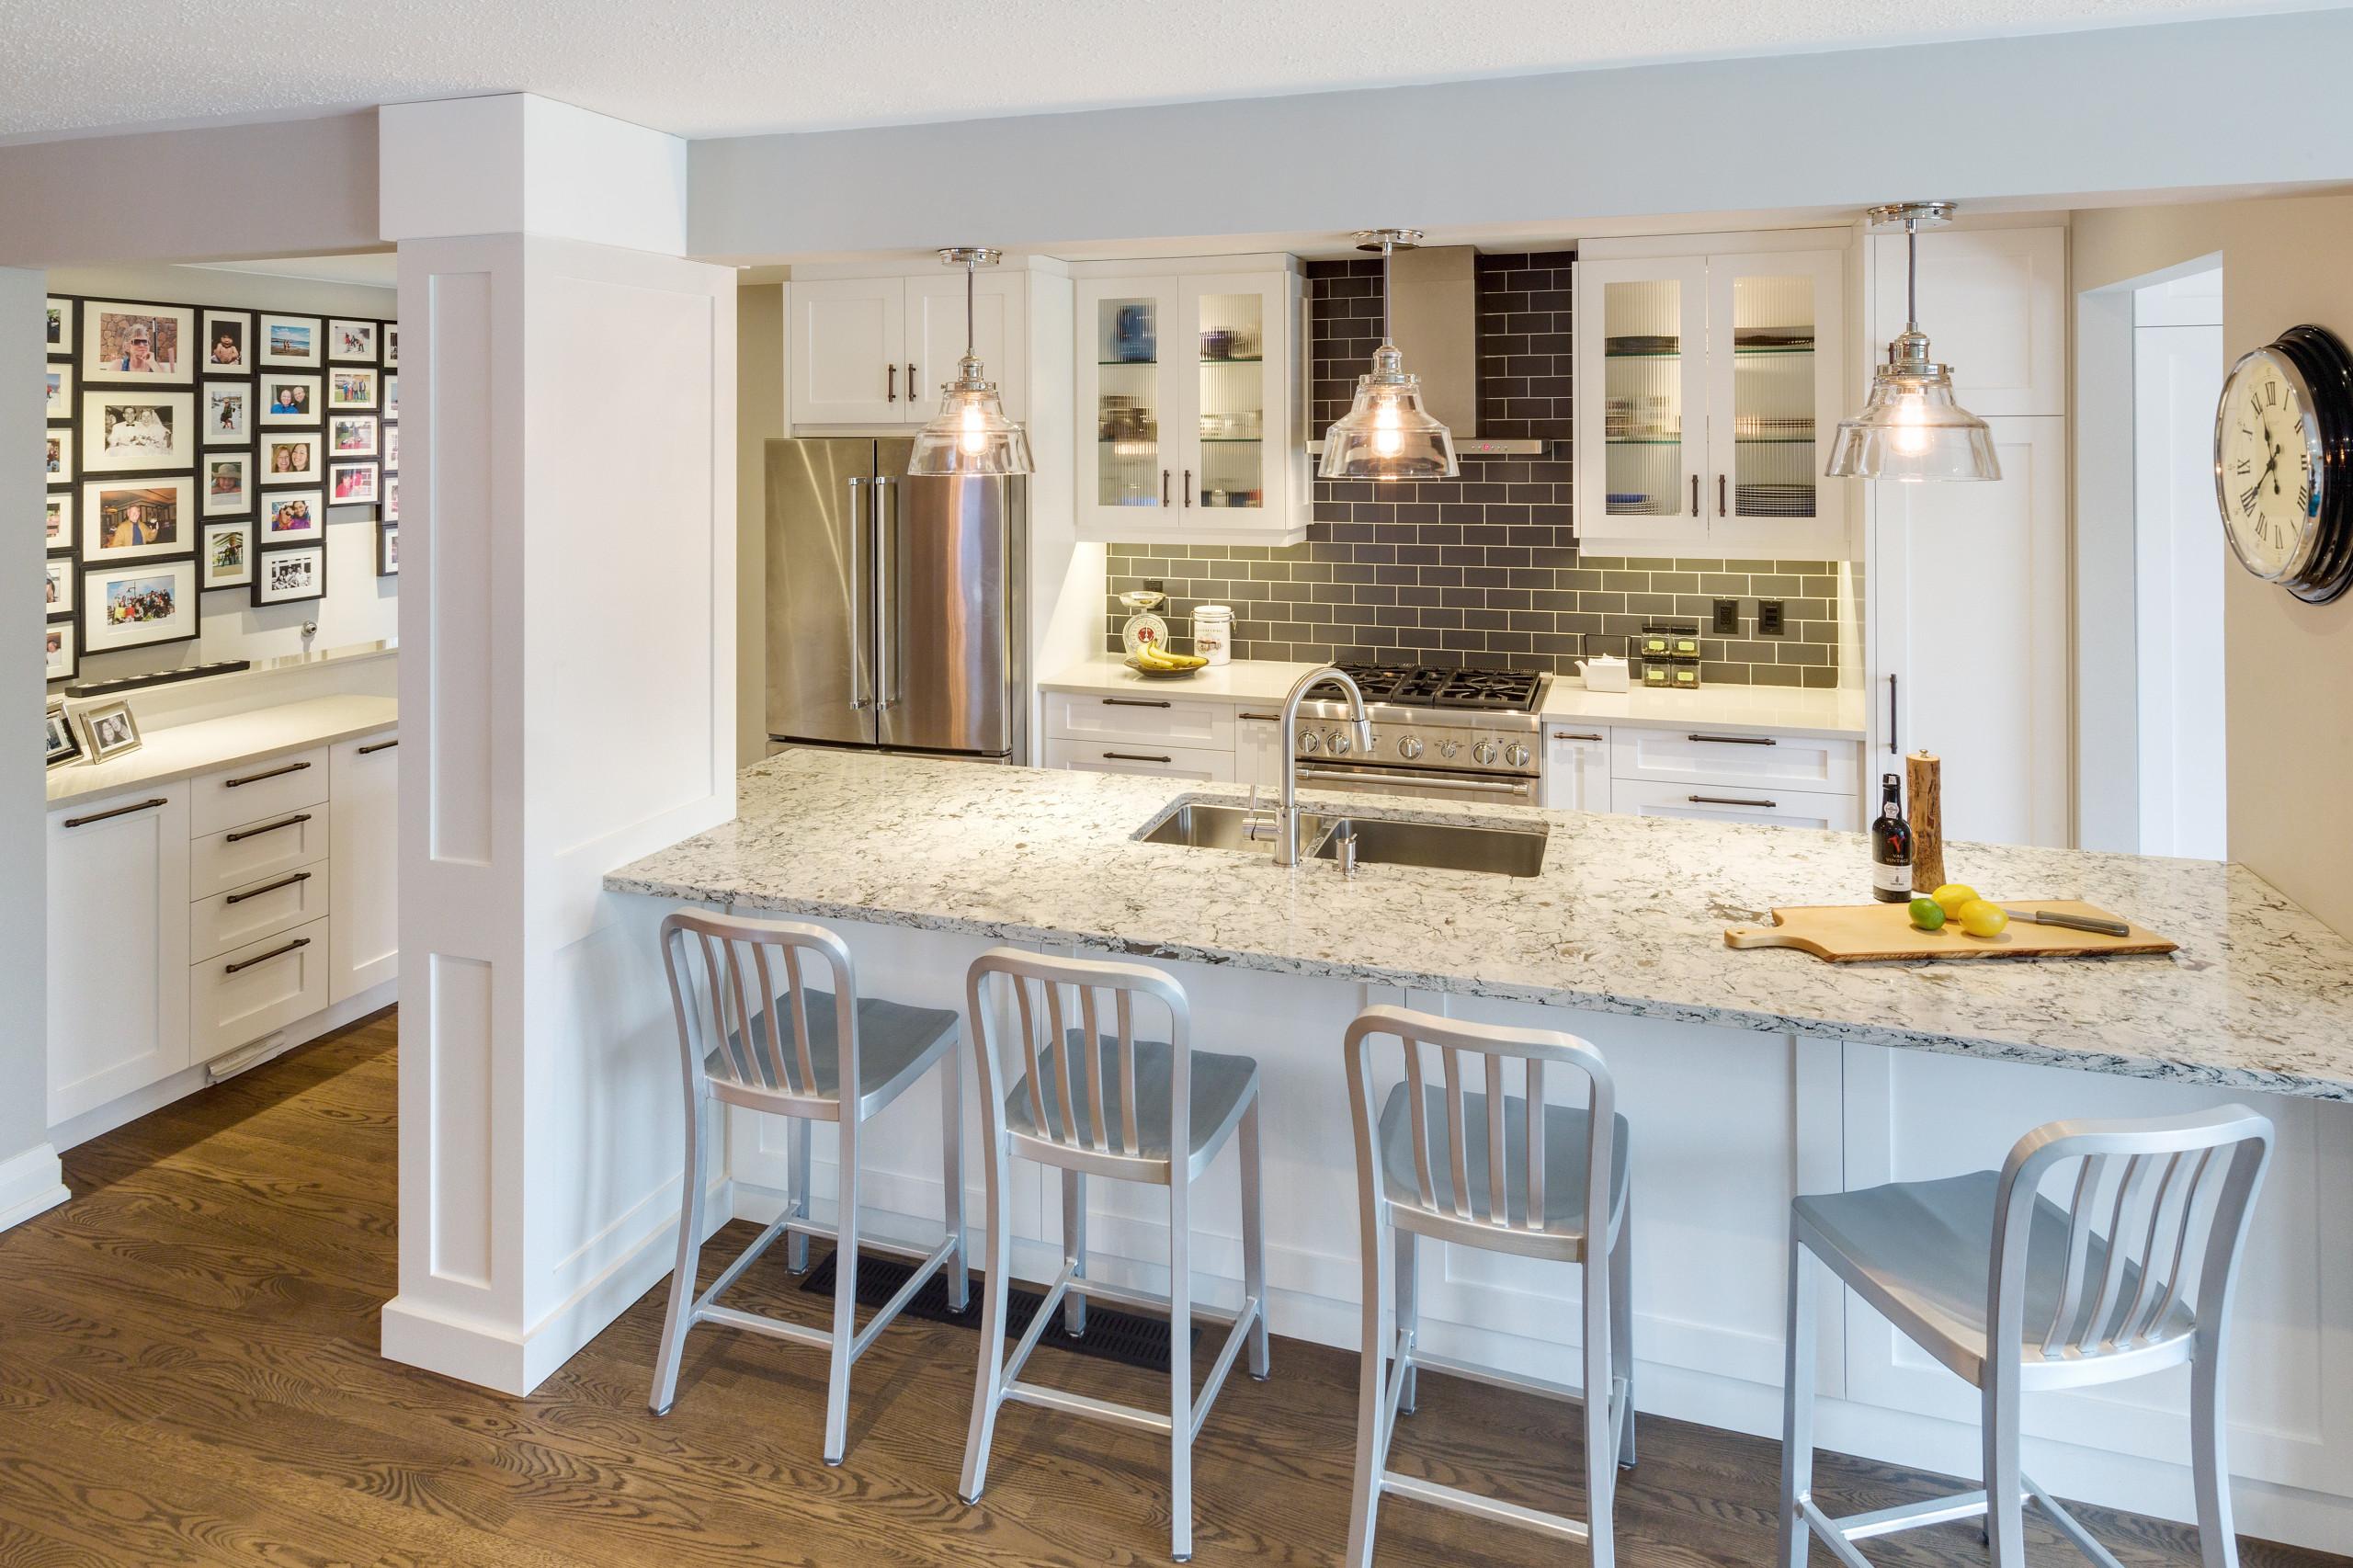 New kitchen bar - After